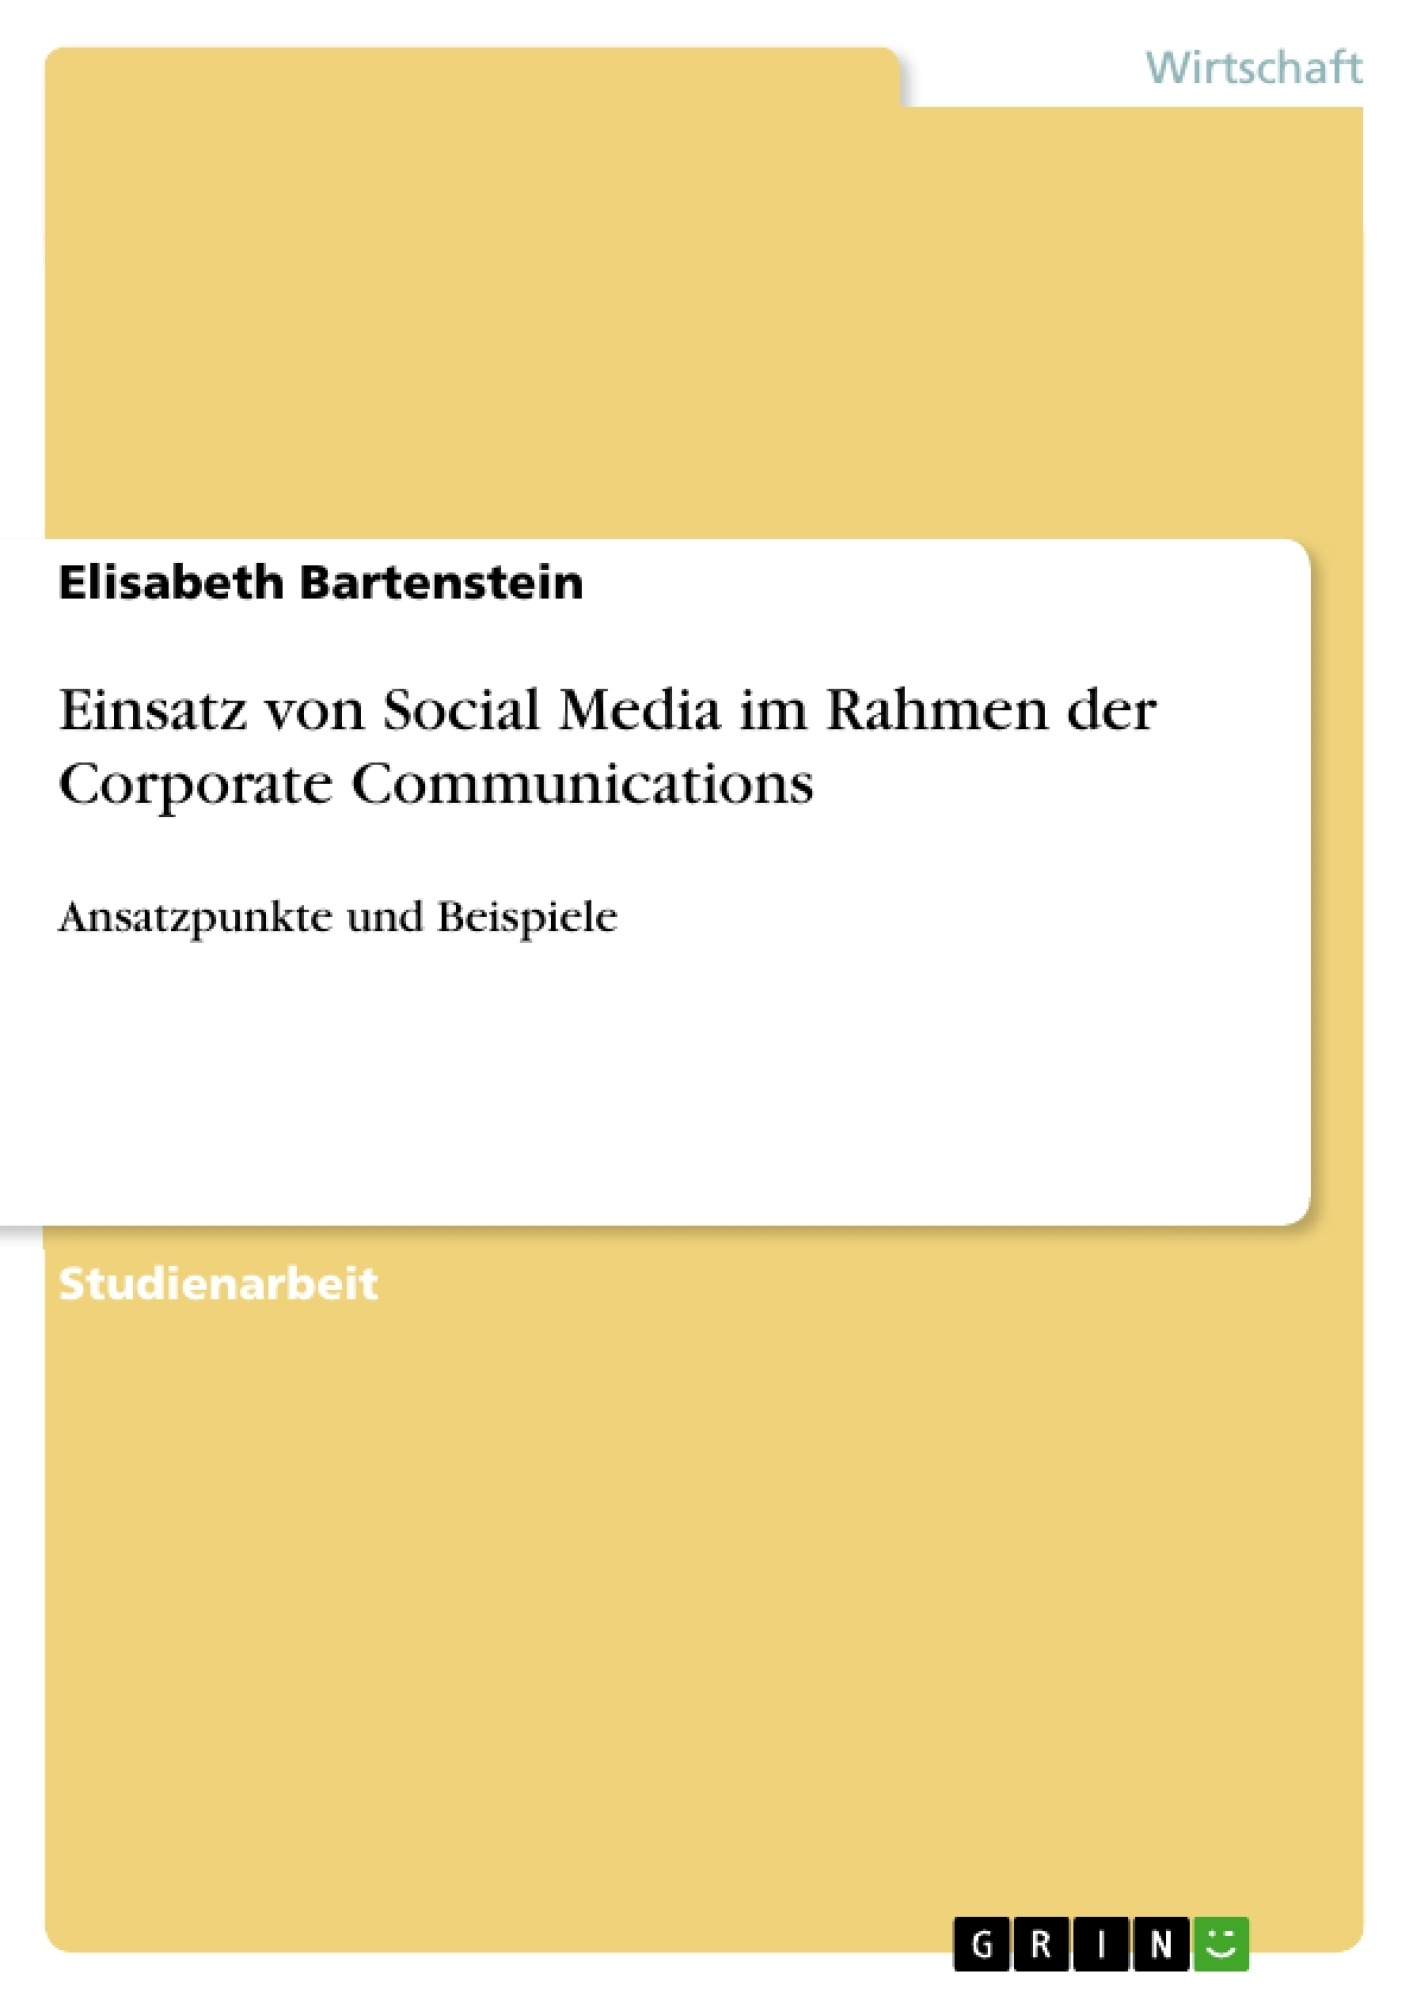 Titel: Social Media im Rahmen der Corporate Communications